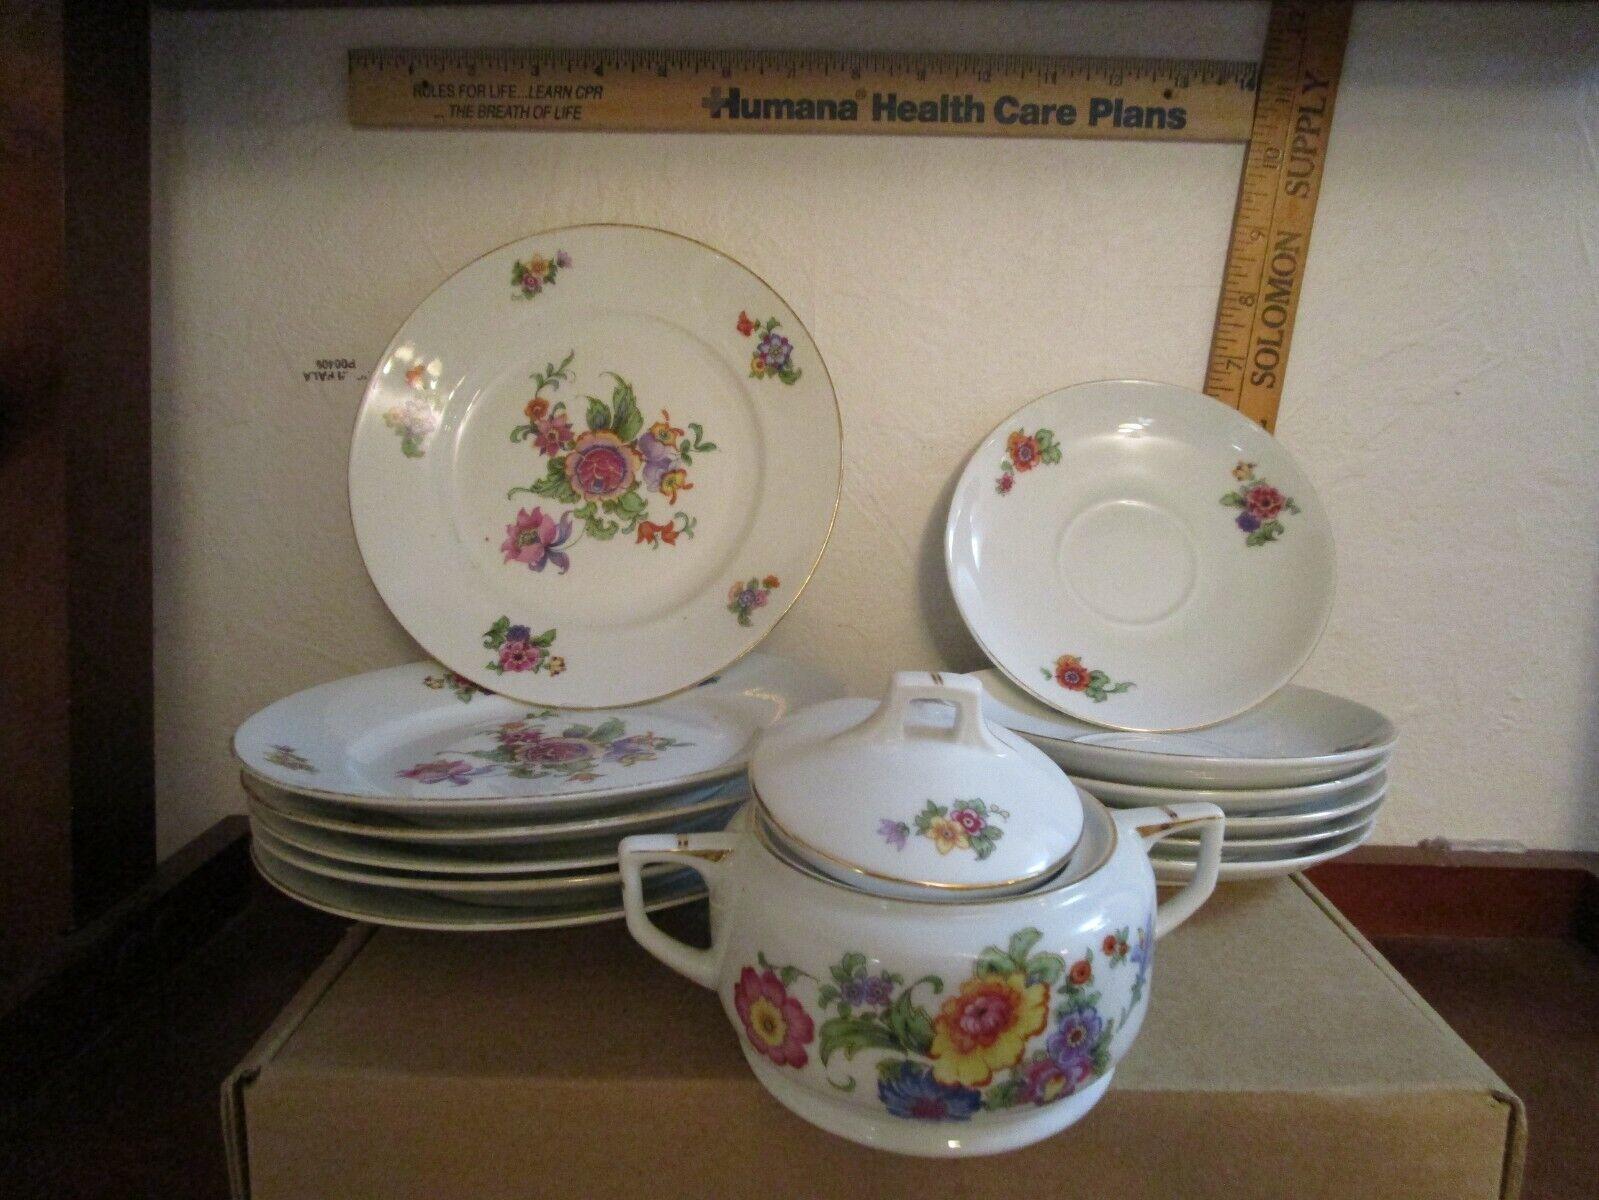 14 Piece Set Original Bloch Co. Eichwald Dinner Plates And Sugar Dish - $20.00